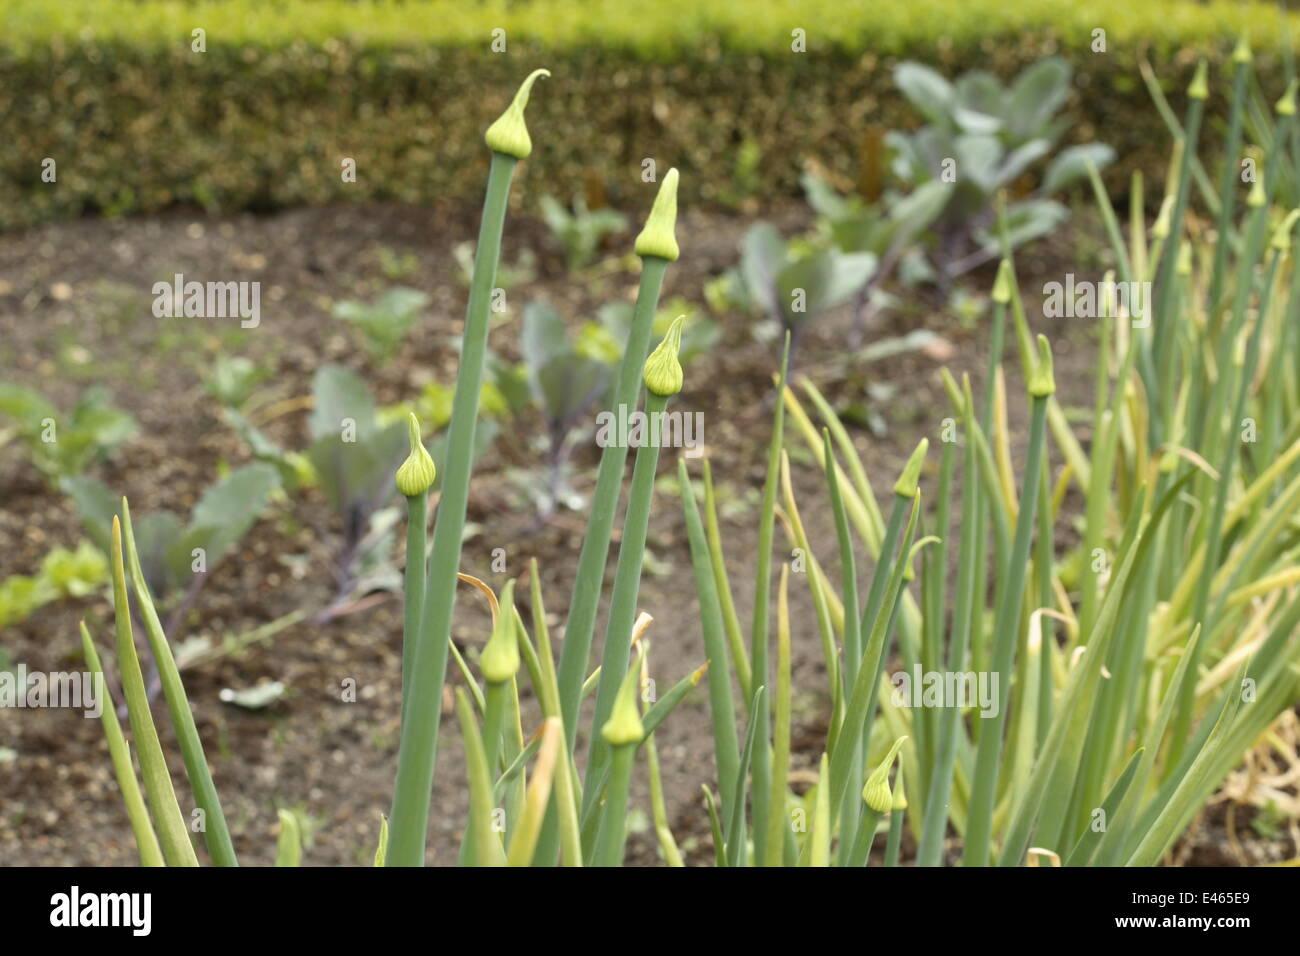 Gemeinsamen Zwiebel - Allium cepa Stockbild